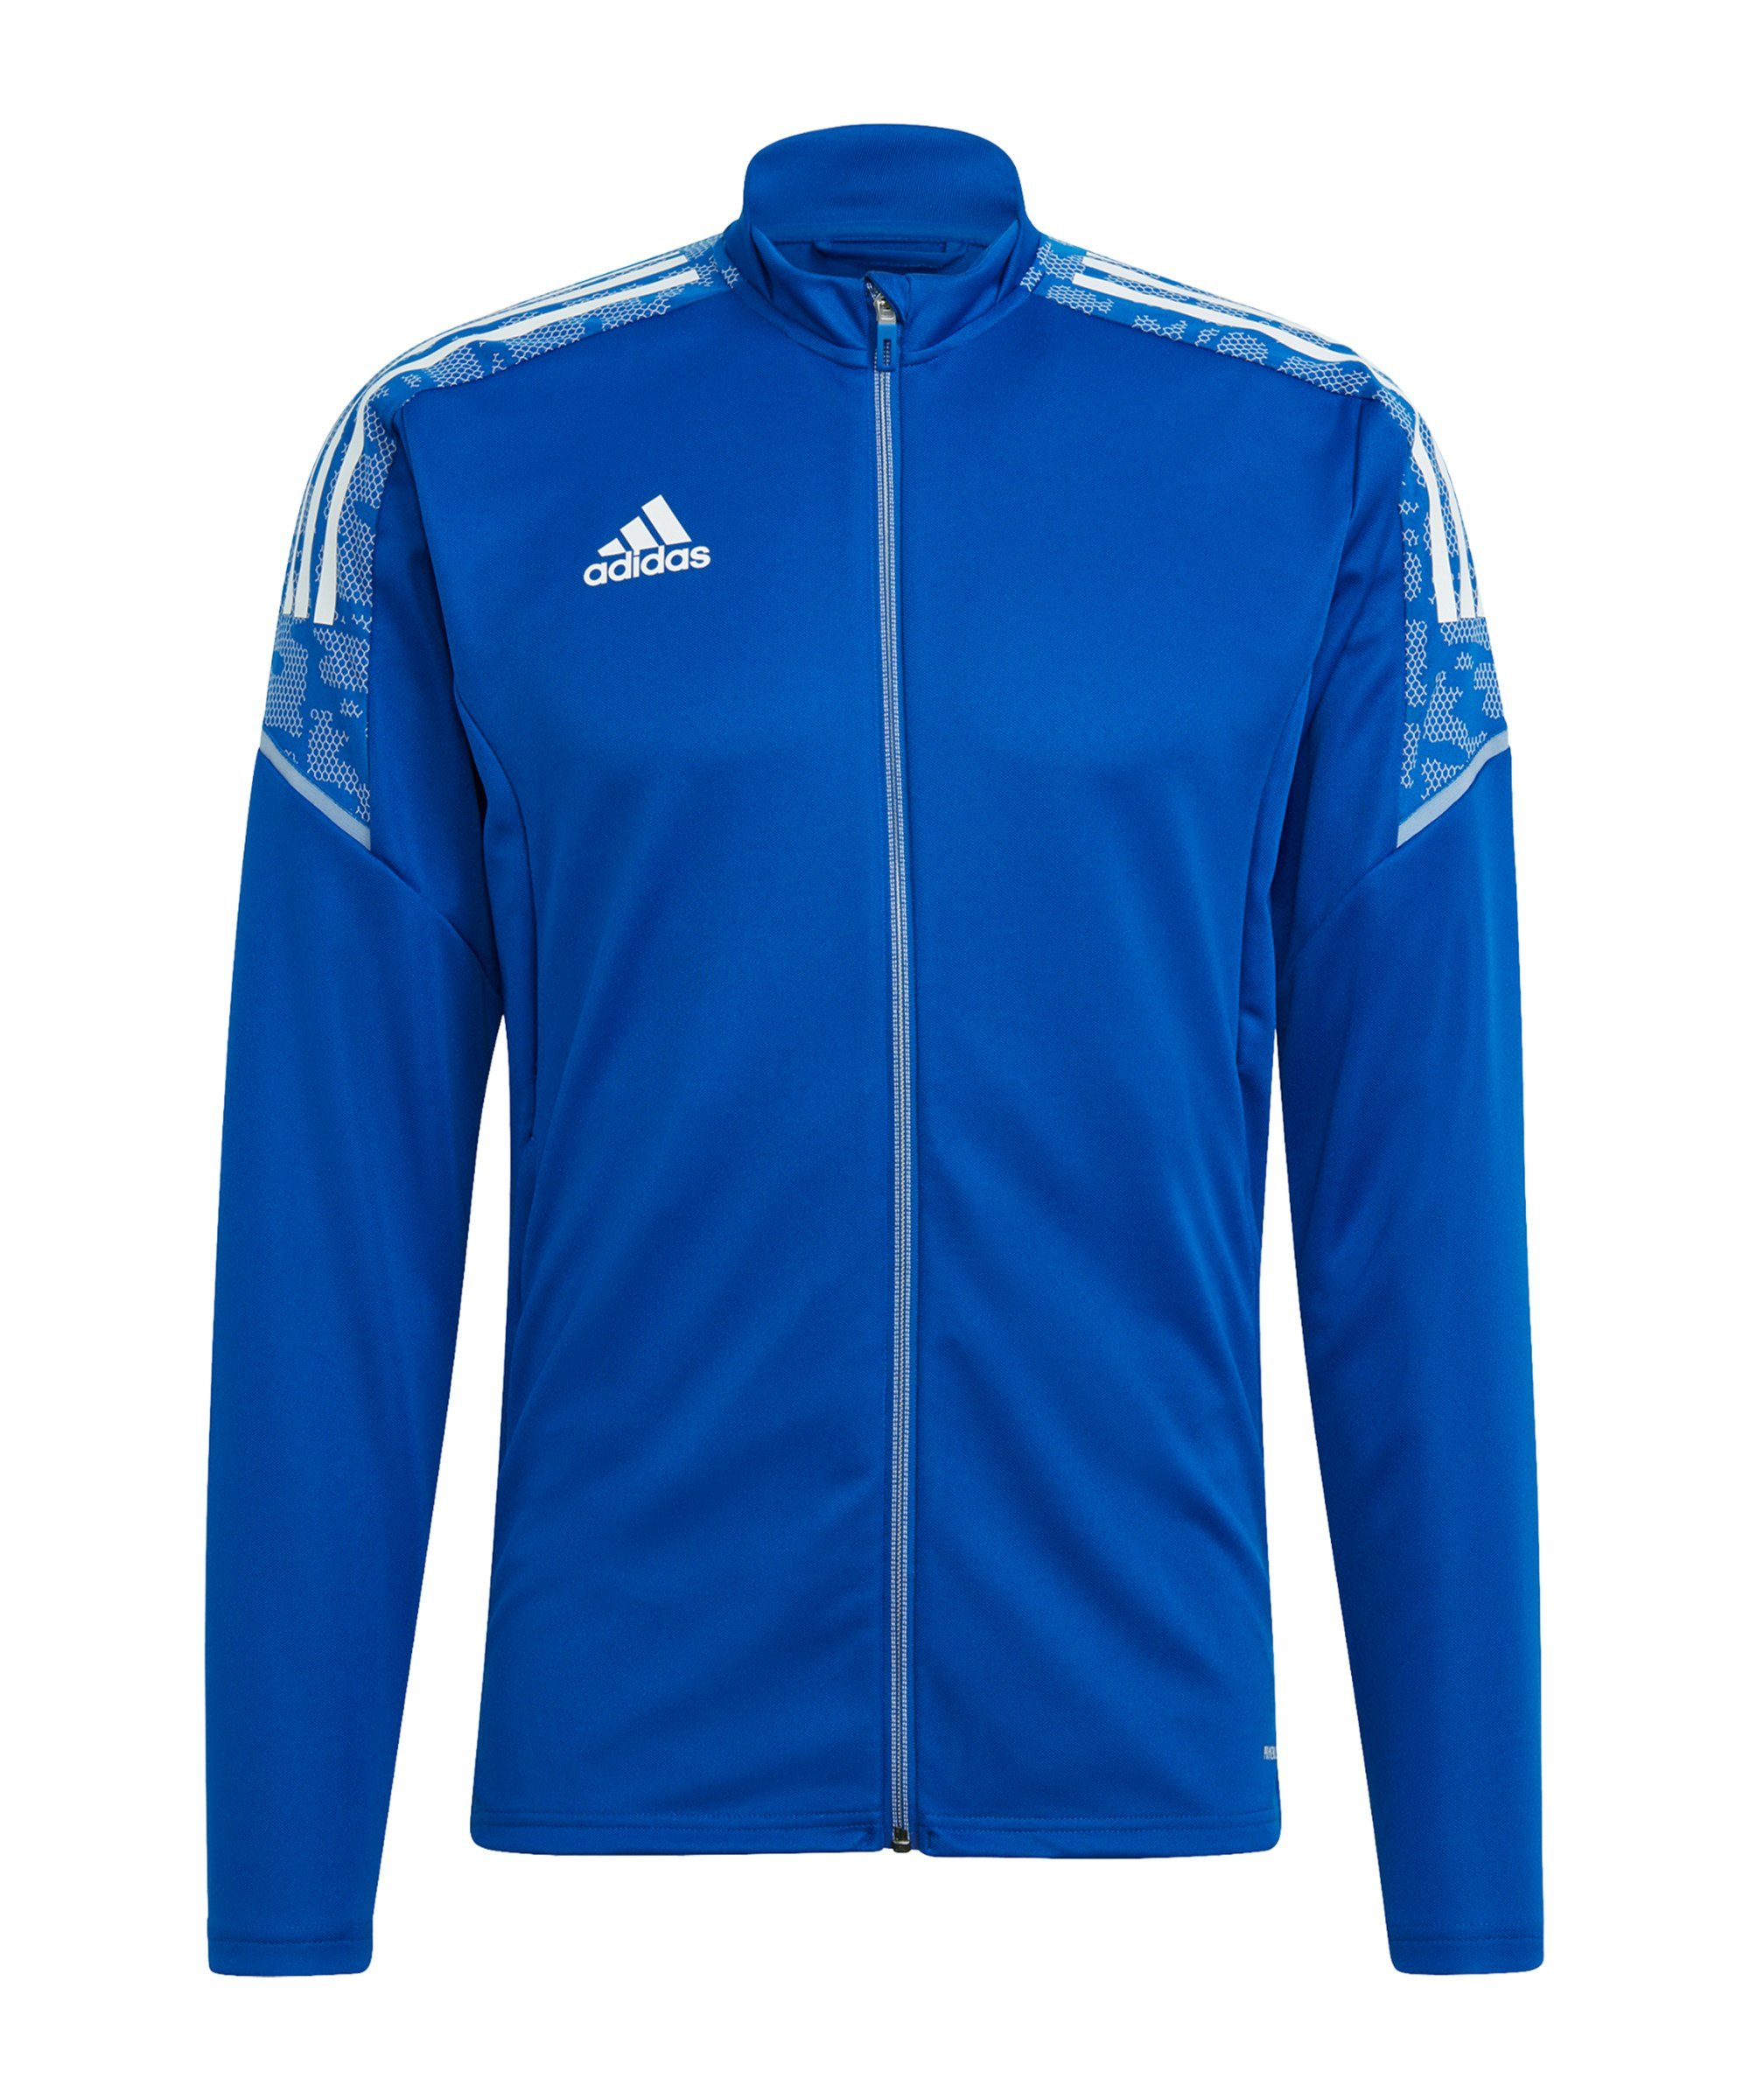 adidas Condivo 21 Trainingsjacke Blau Weiss - blau